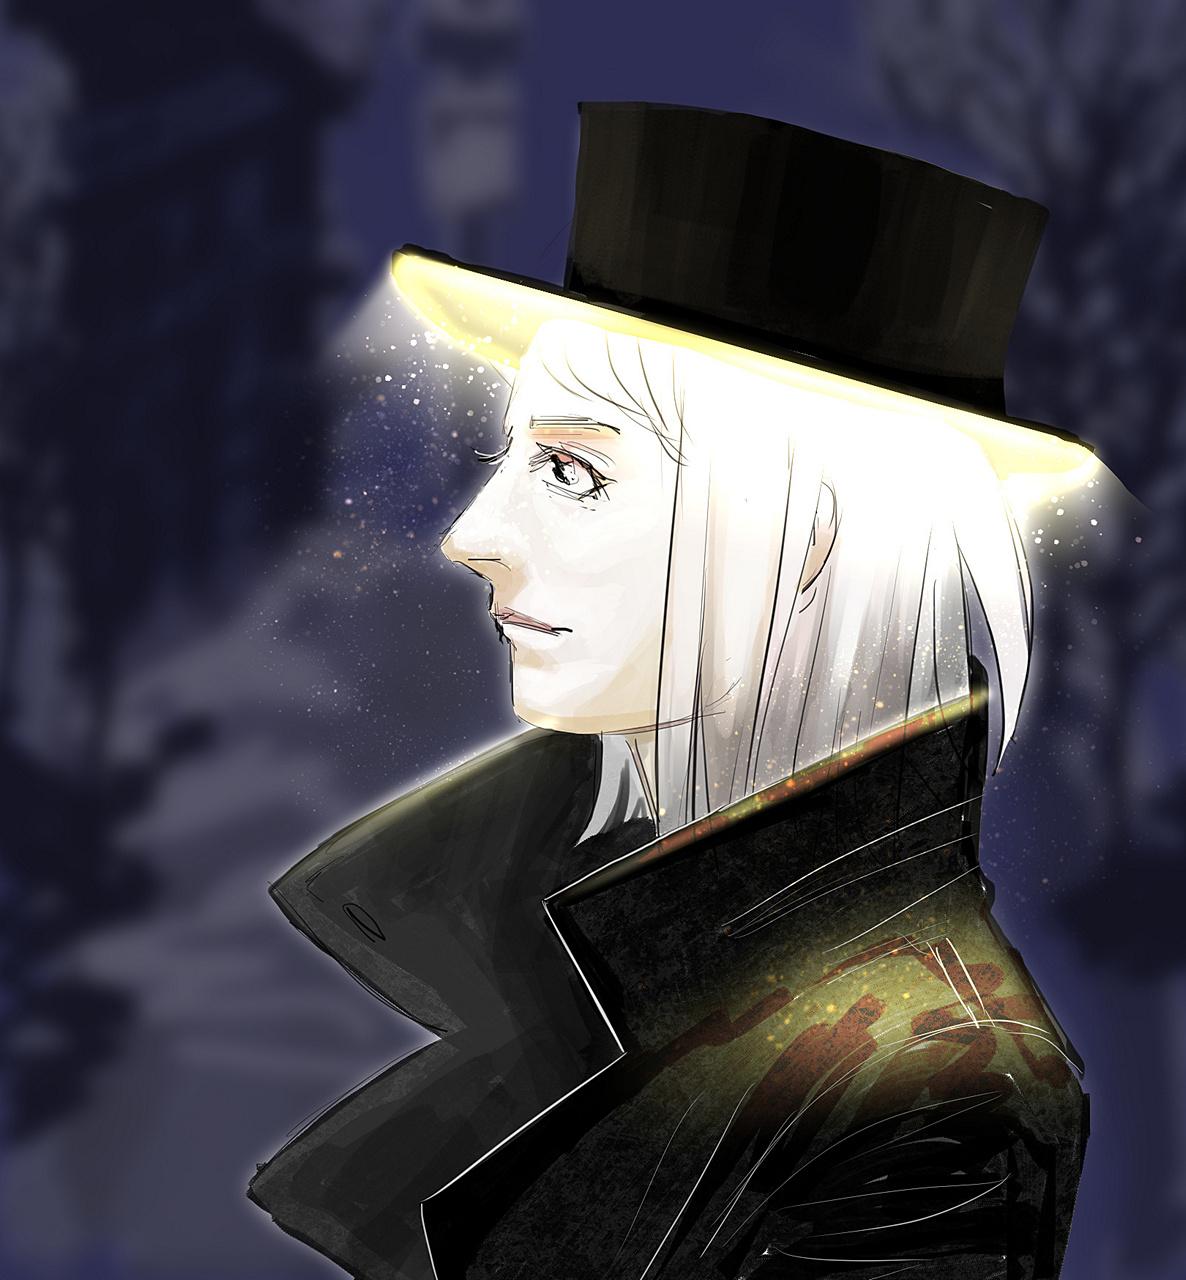 Rin's halo hat